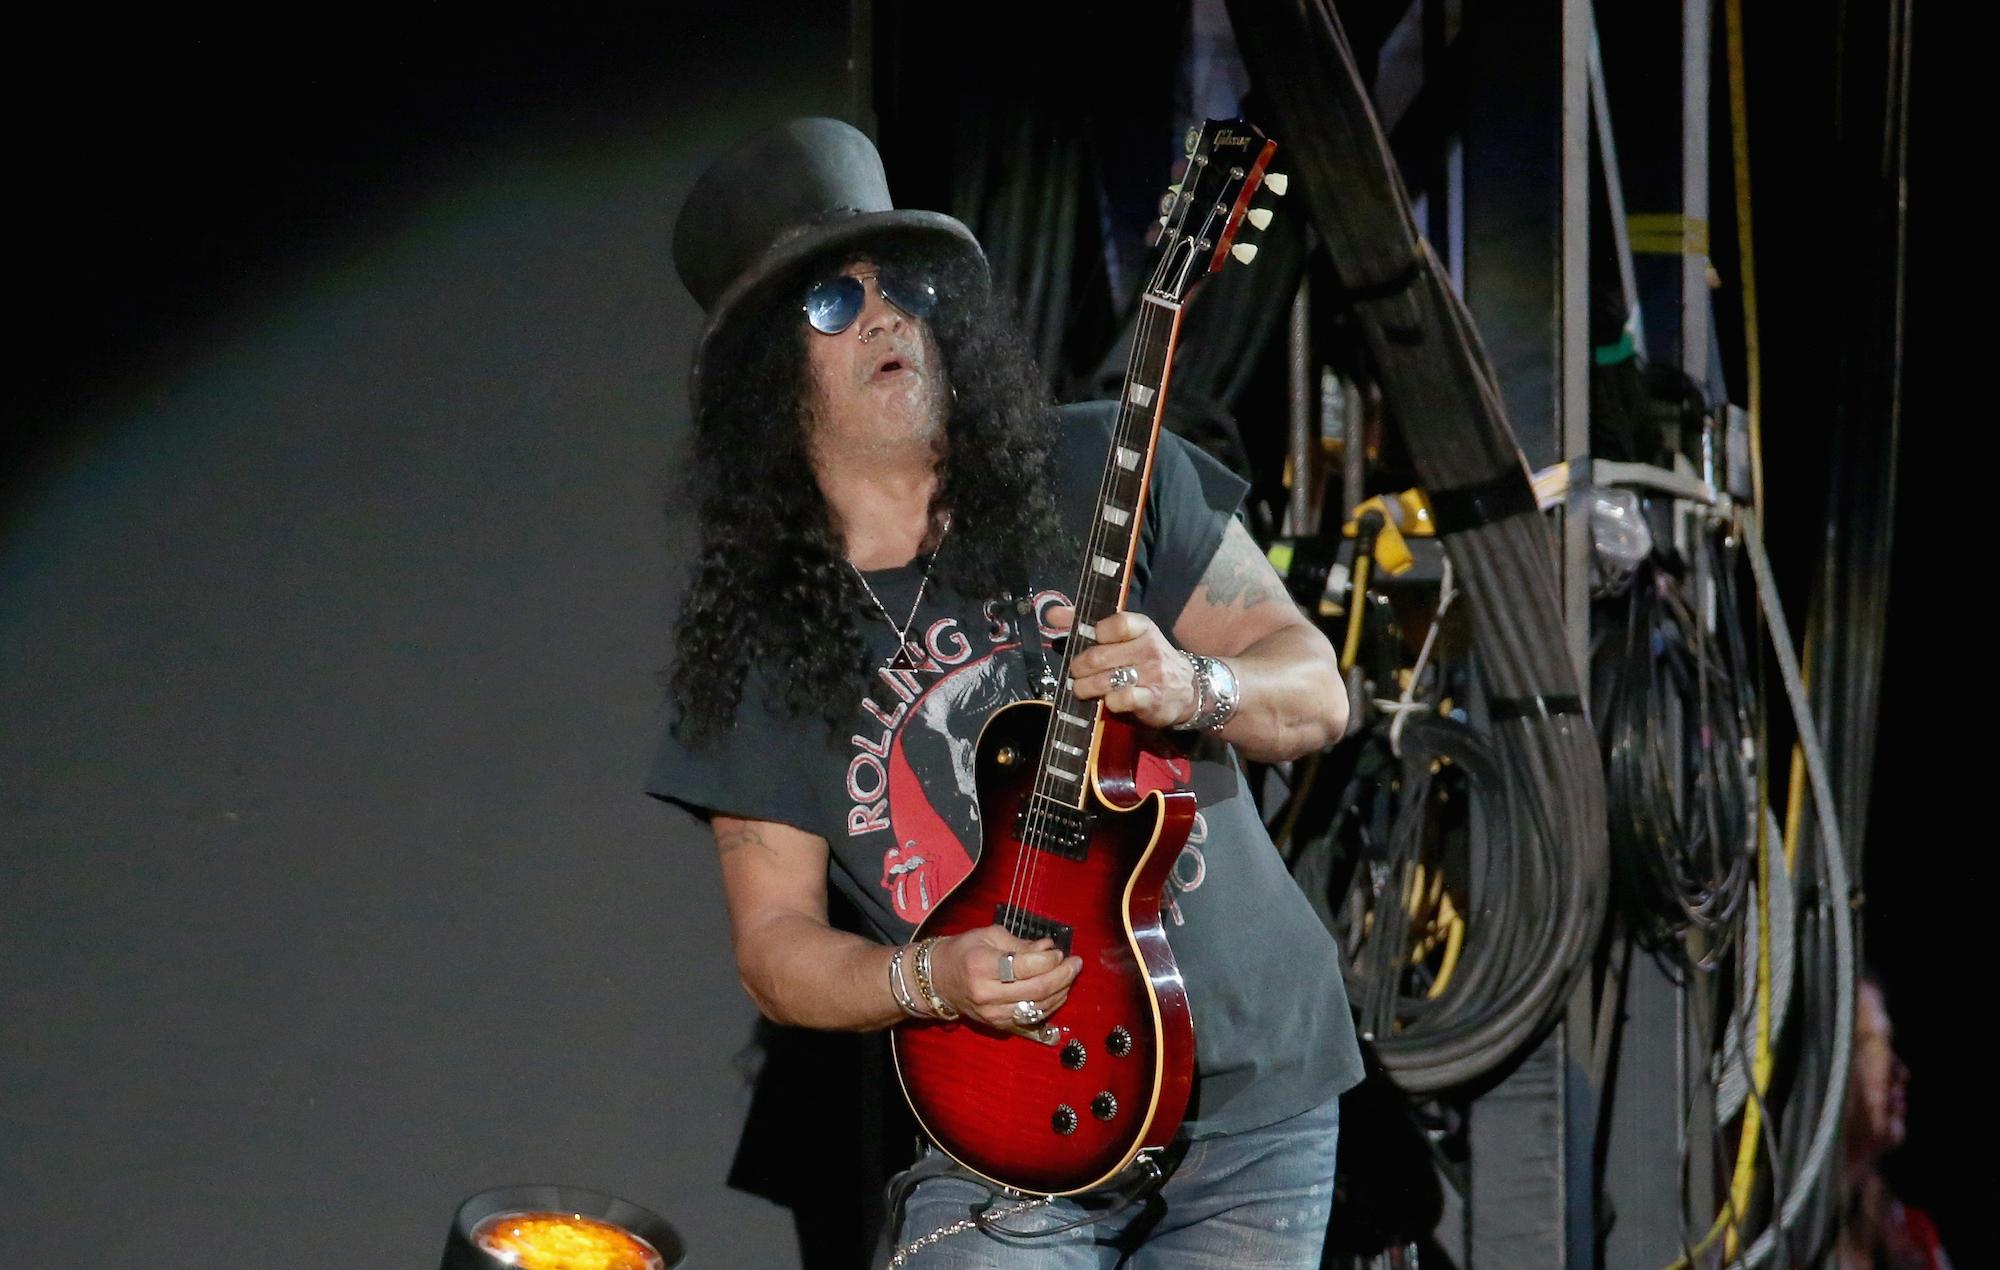 Slash of Guns N' Roses. Credit: Gary Miller/Getty Images